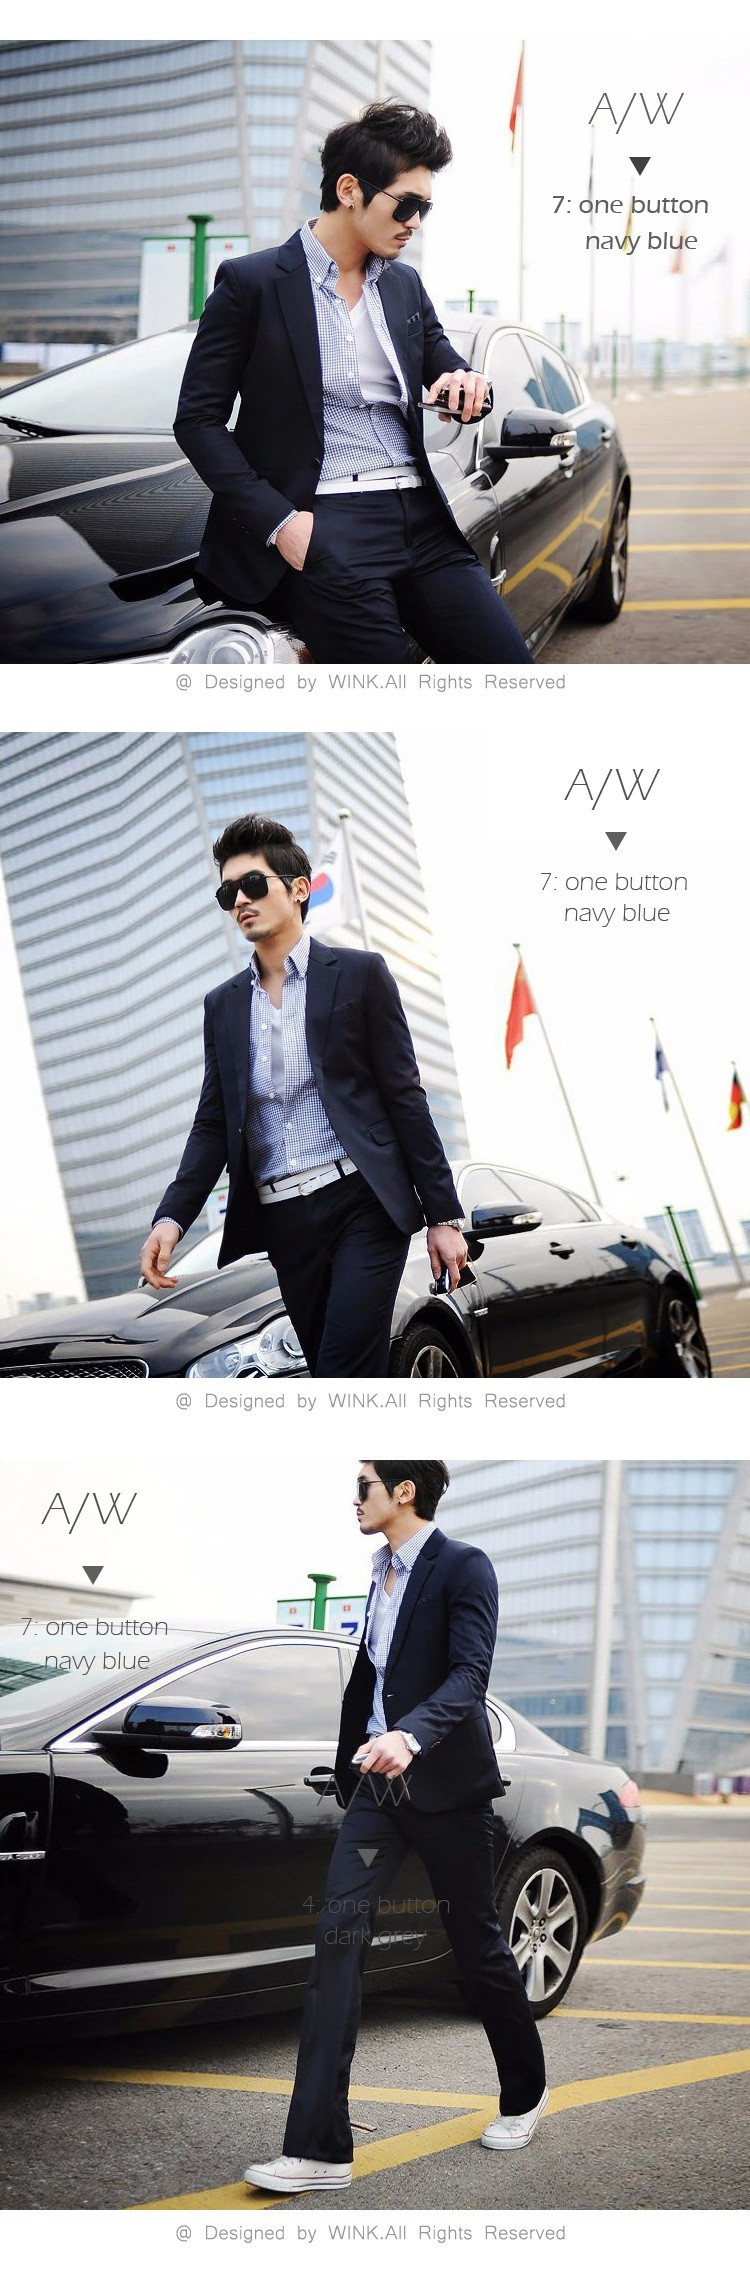 HTB170fRLVXXXXXDaXXXq6xXFXXXP - (Jacket+Pant+Tie) Men Wedding Suit Sets Tuxedo Formal Fashion Slim Fit Business Dress Suits Blazer Brand Party Masculino Suits